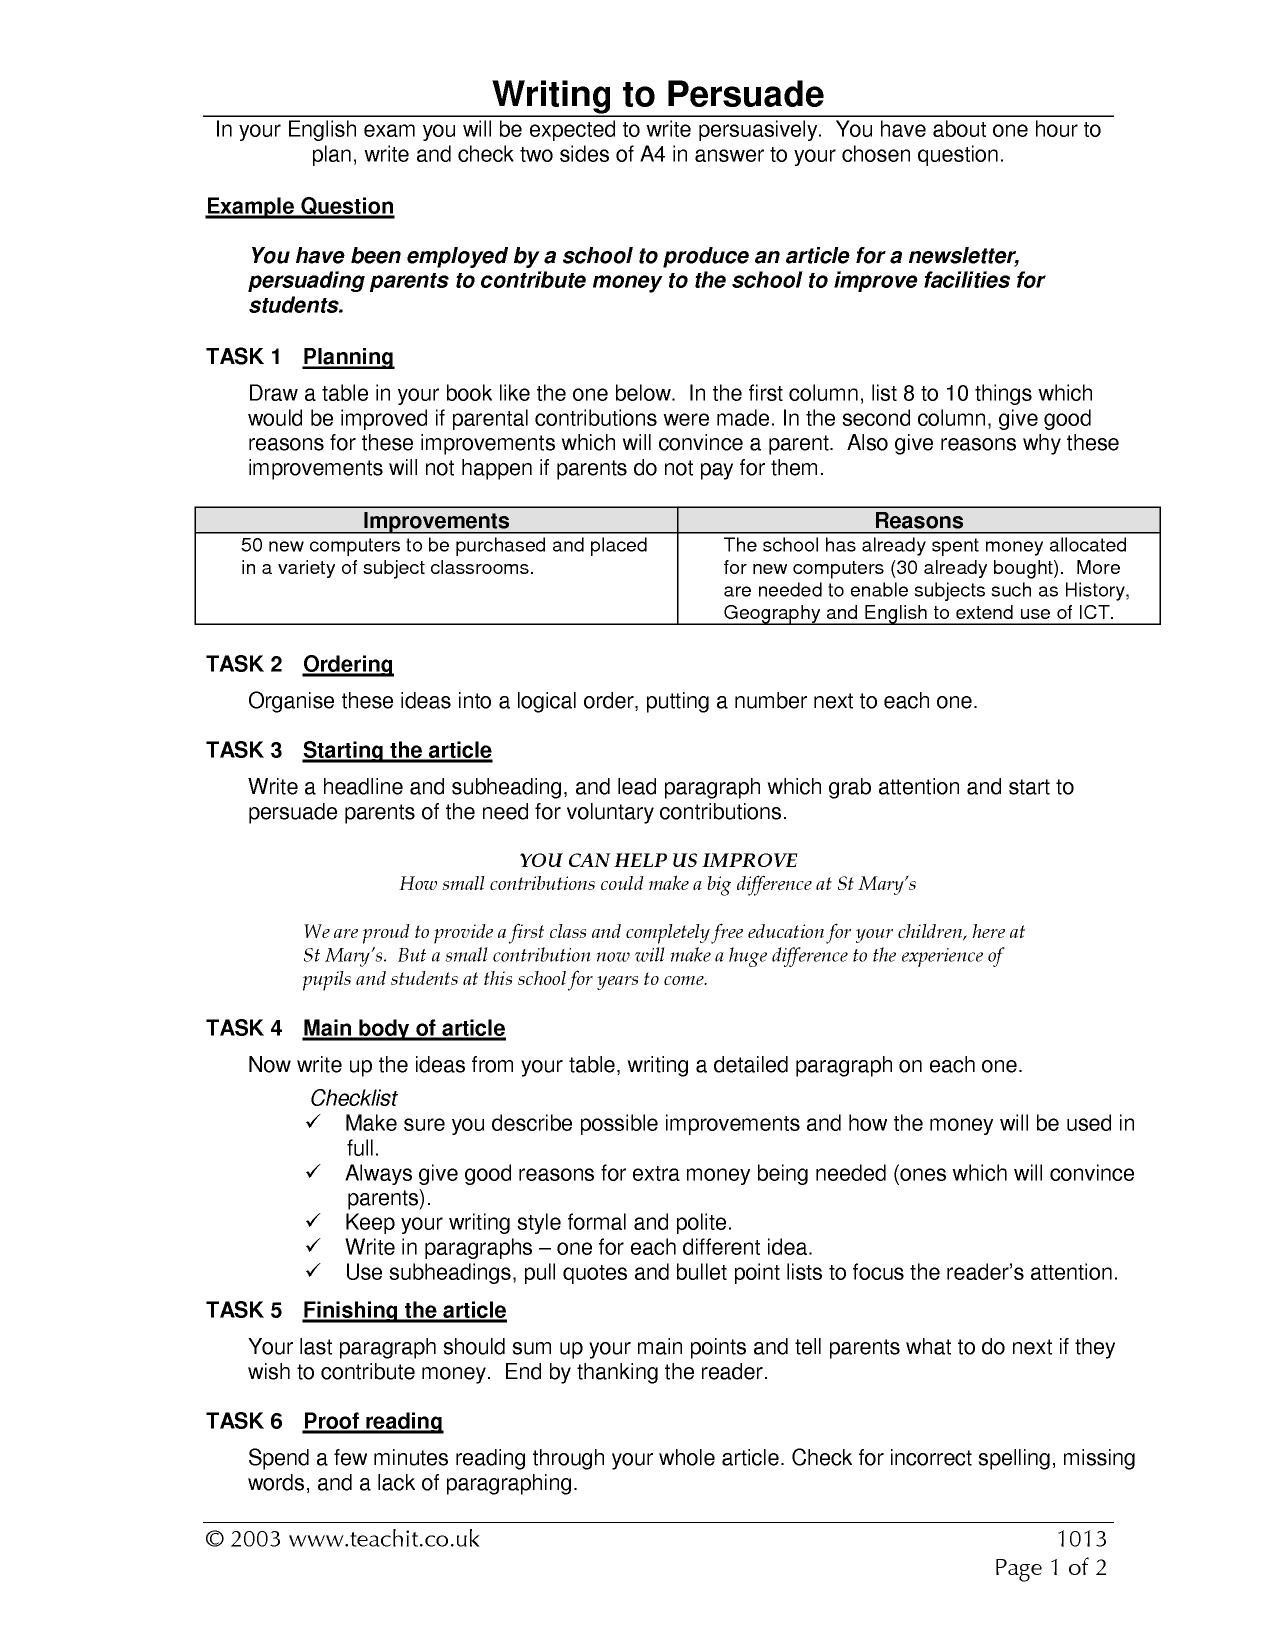 Ks4 writing argument and persuasive writing teachit english 4 preview spiritdancerdesigns Choice Image